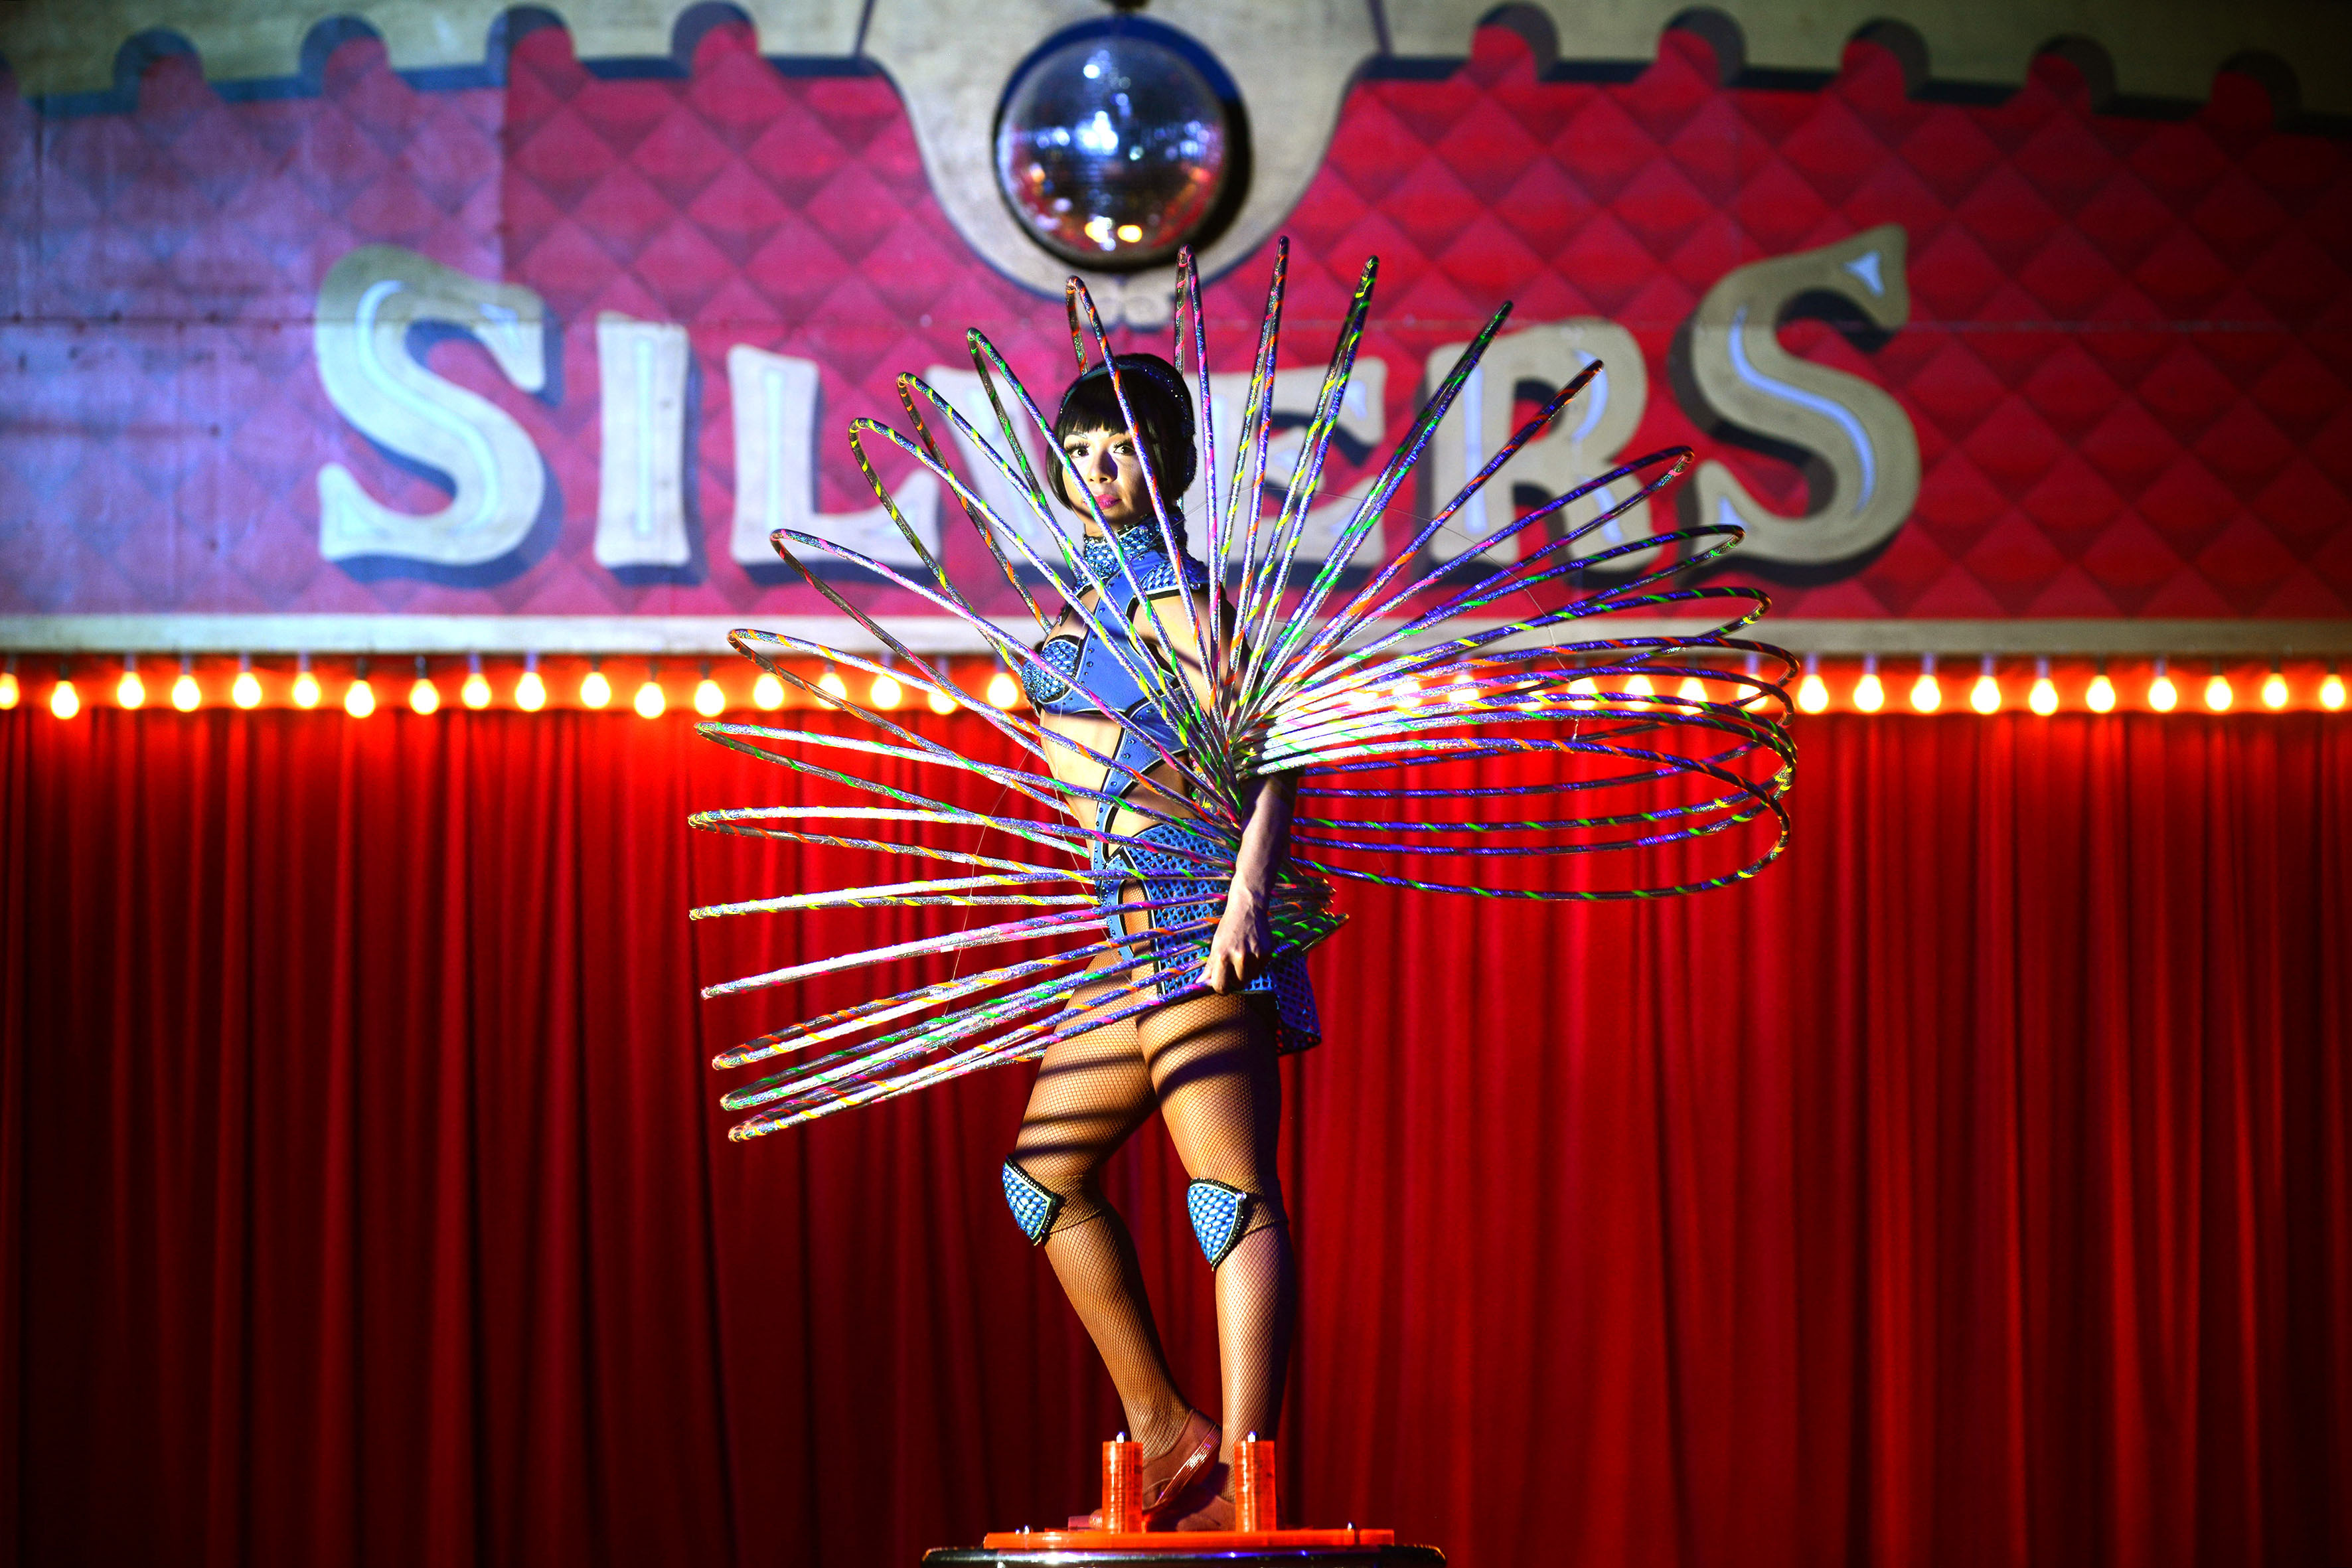 Silvers Circus Image